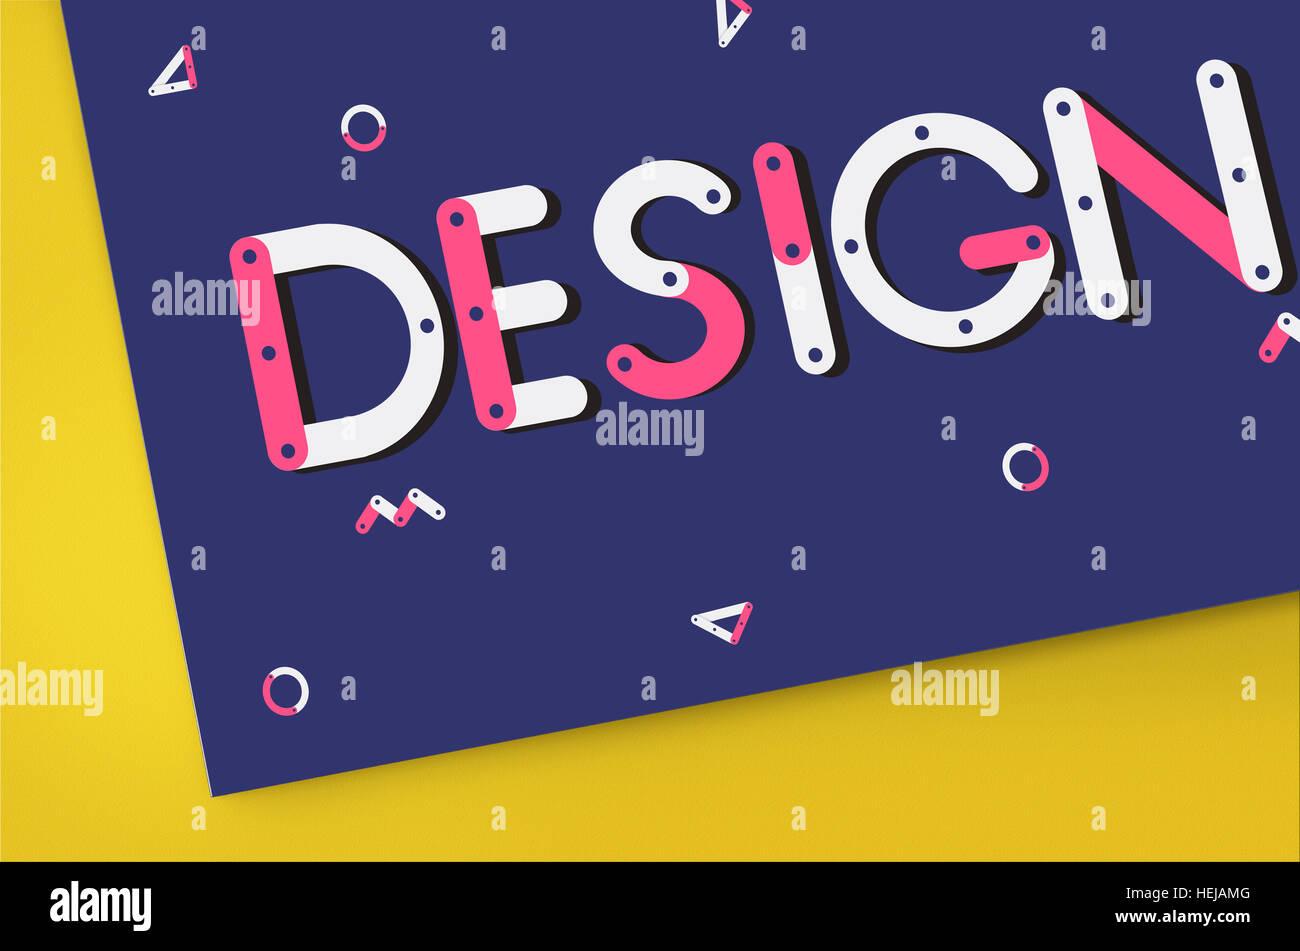 Ideas Design Draft Creative Sketch Objective Concept - Stock Image